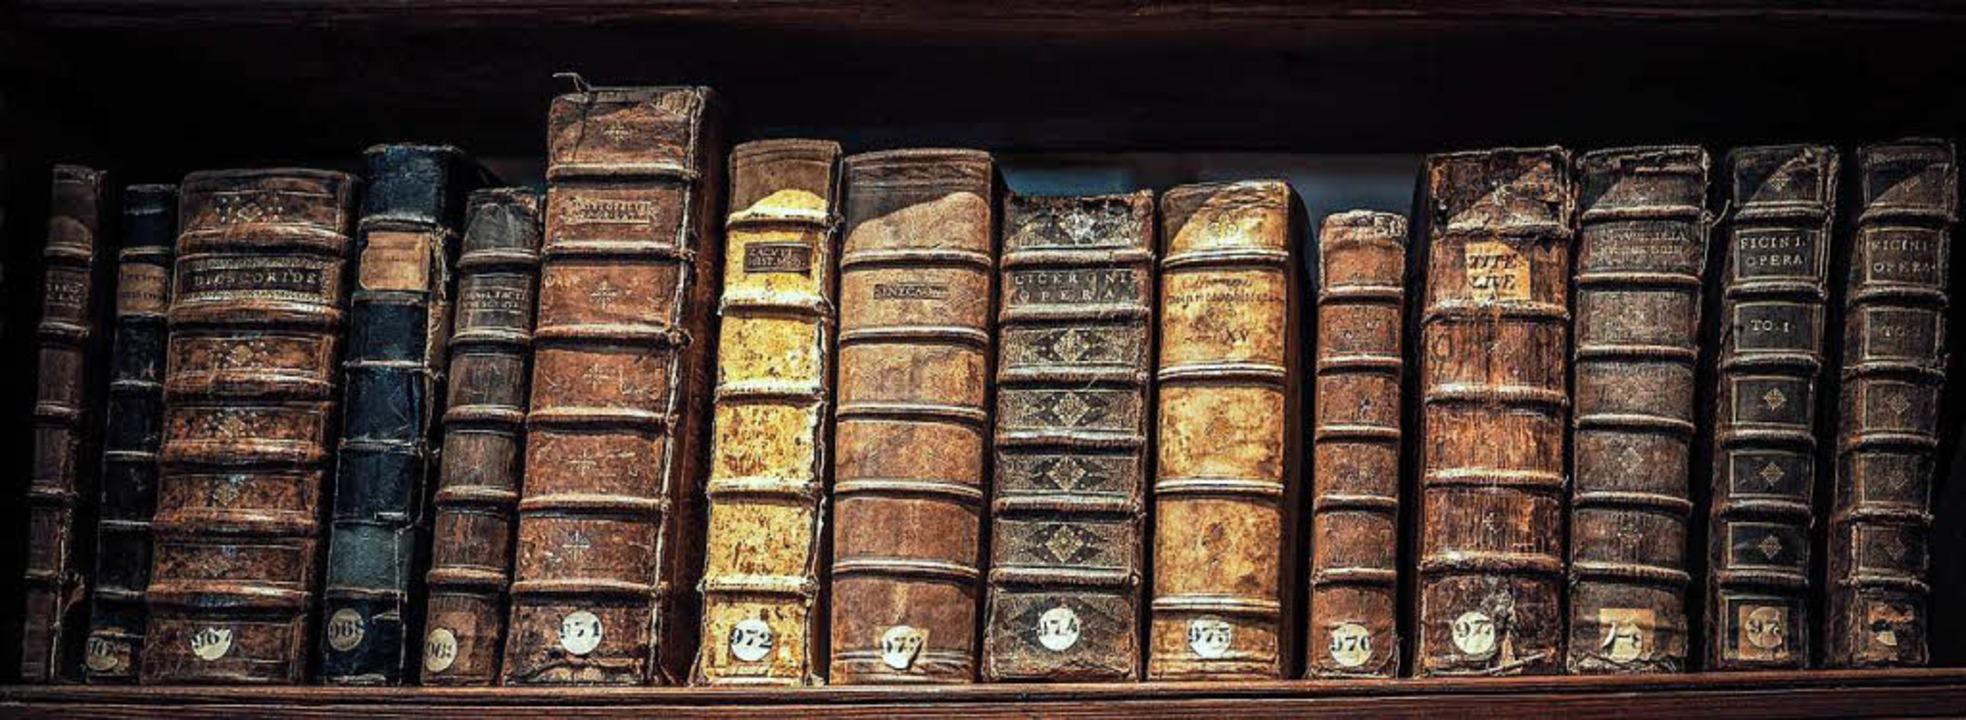 Alte Bücher sind als Kulturgut zu schützen.  | Foto: Frédéric Prochasson - Fotolia